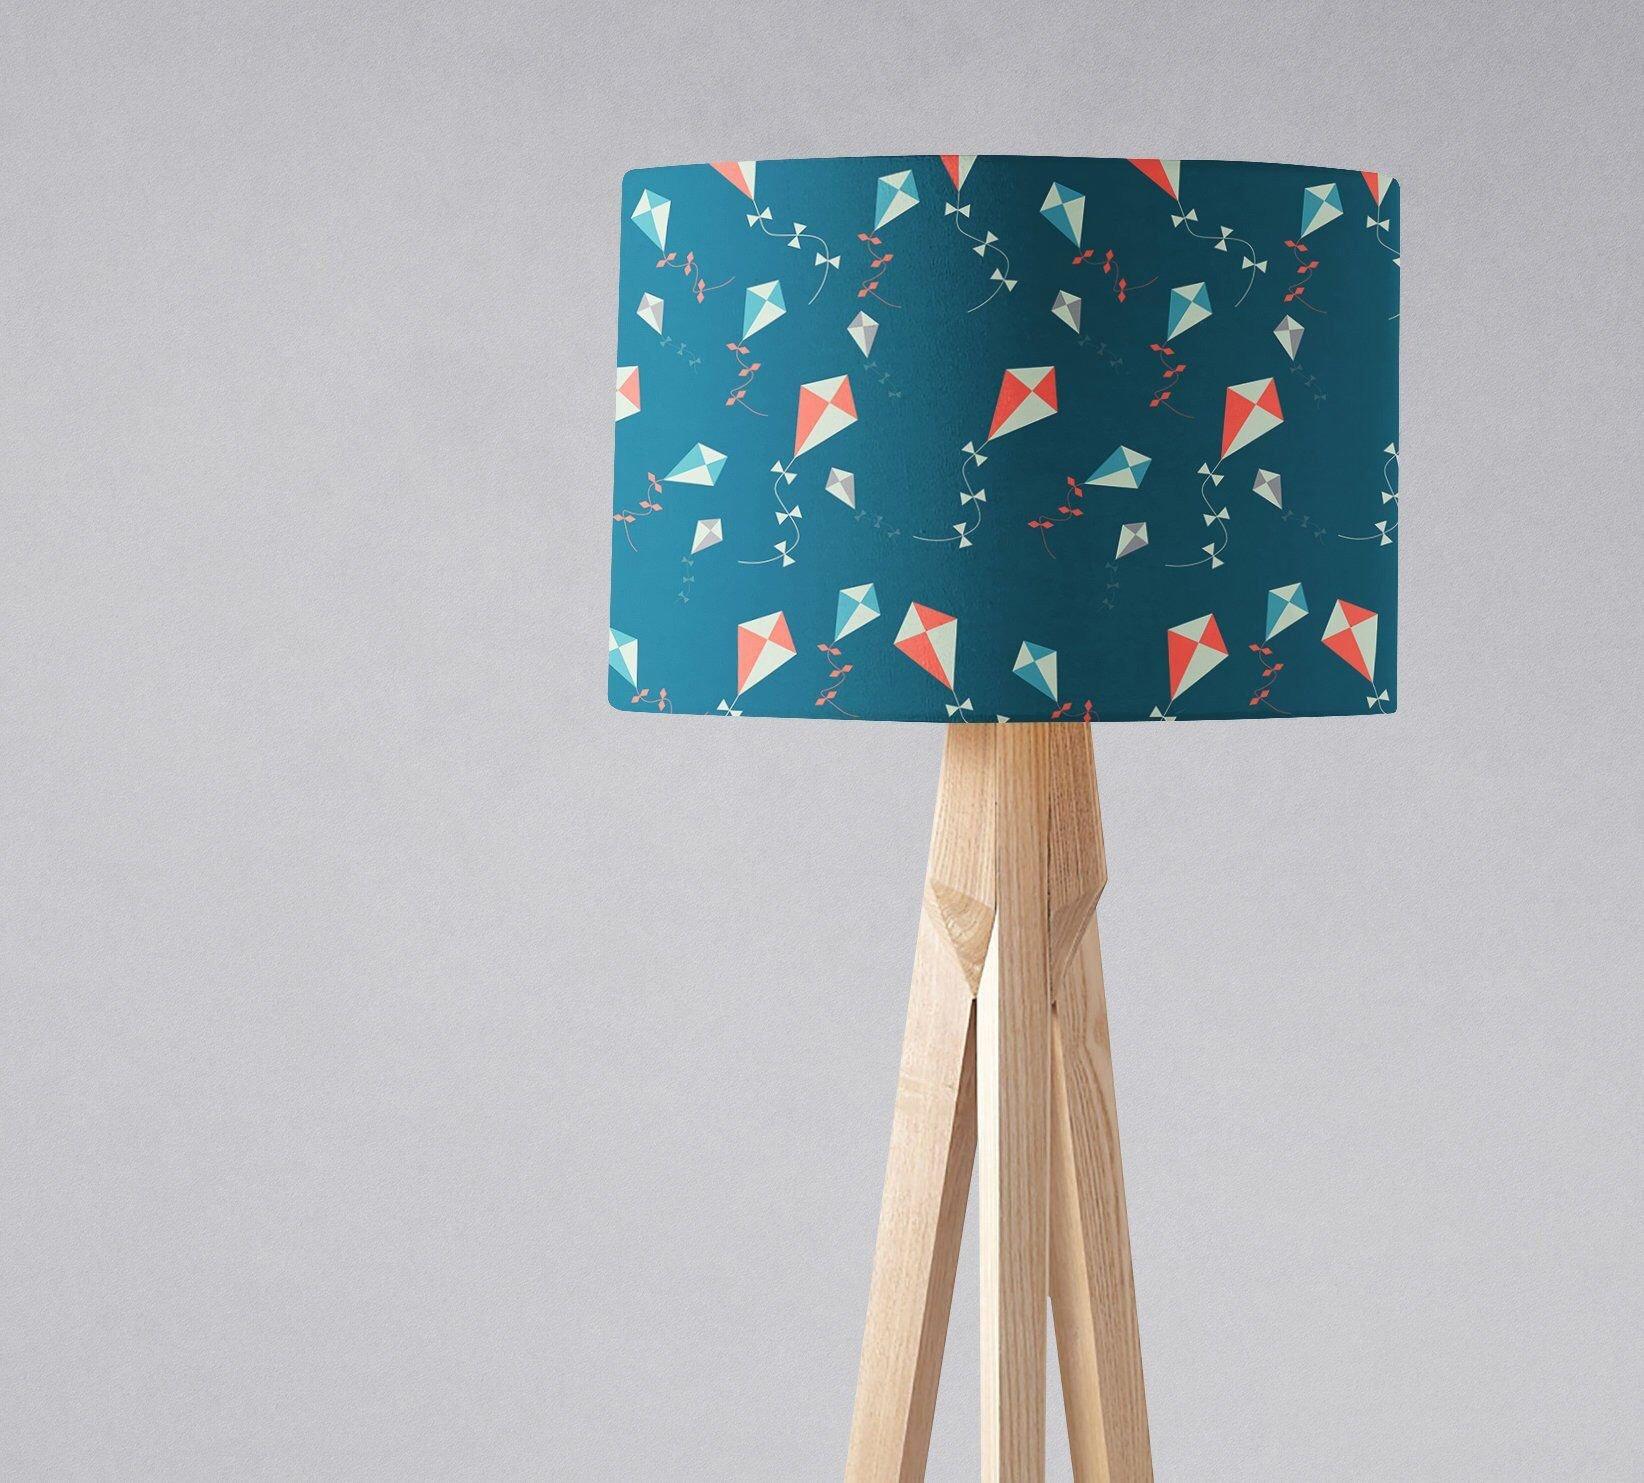 Blue Table Lamps Bedroom Lovely Kite Lampshade Kite Decor Drum Light Shade Harp Fitting